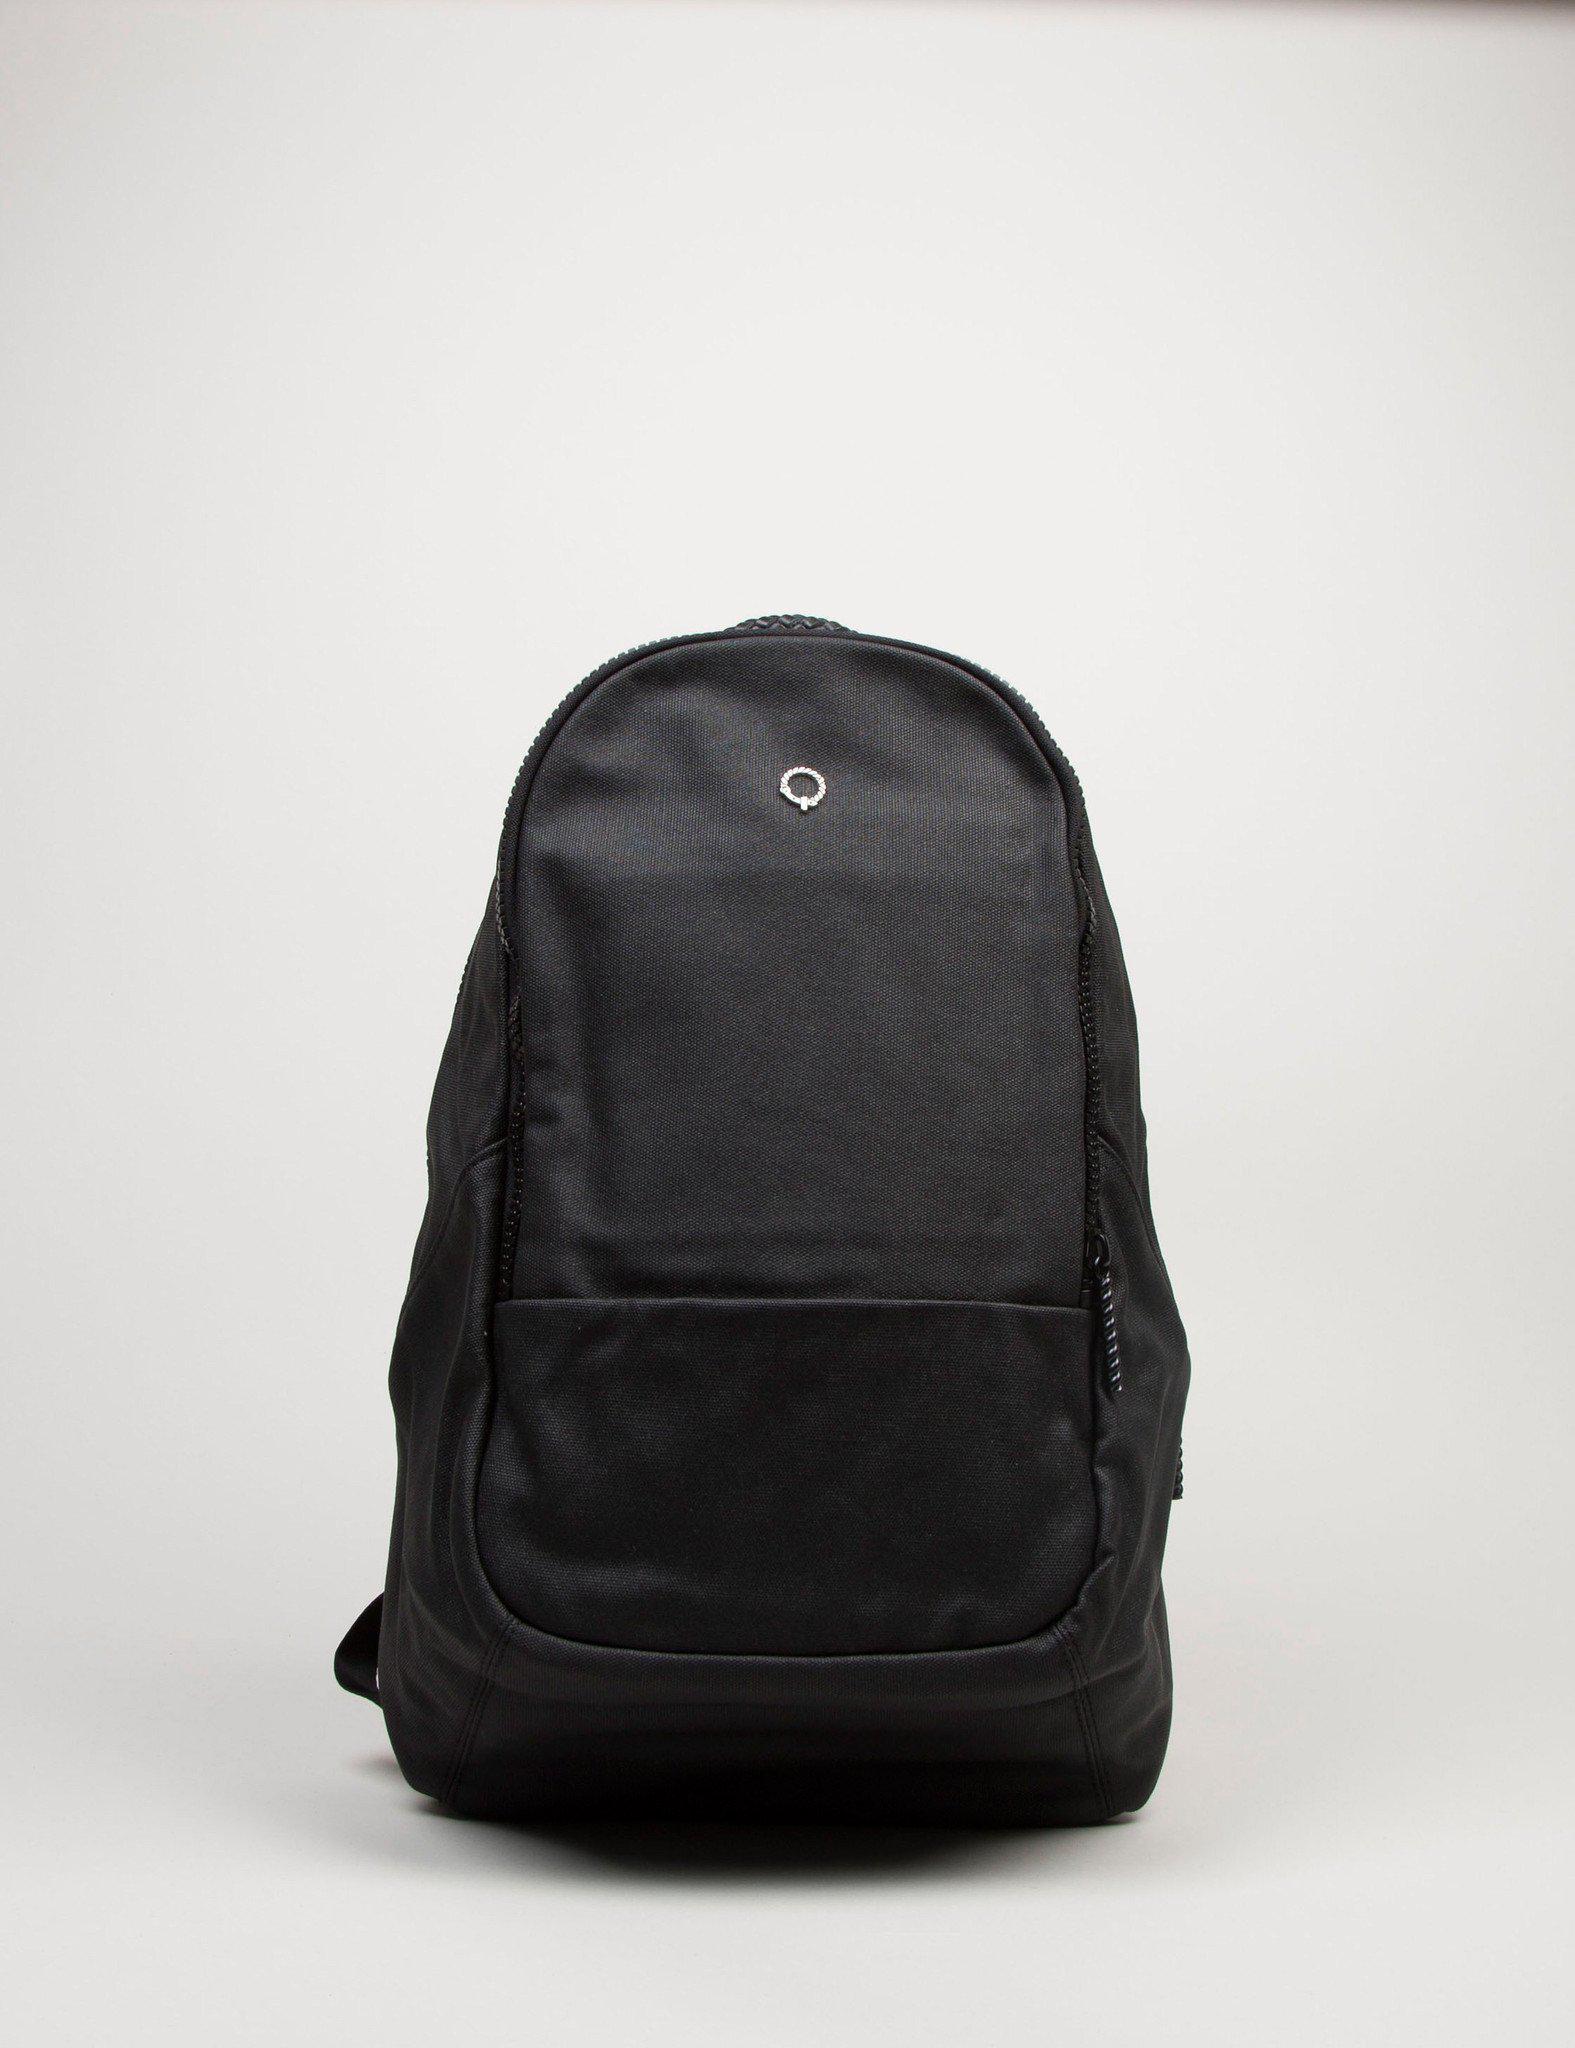 2a6288e242ae Stighlorgan Dara Ziptop Backpack in Black for Men - Lyst